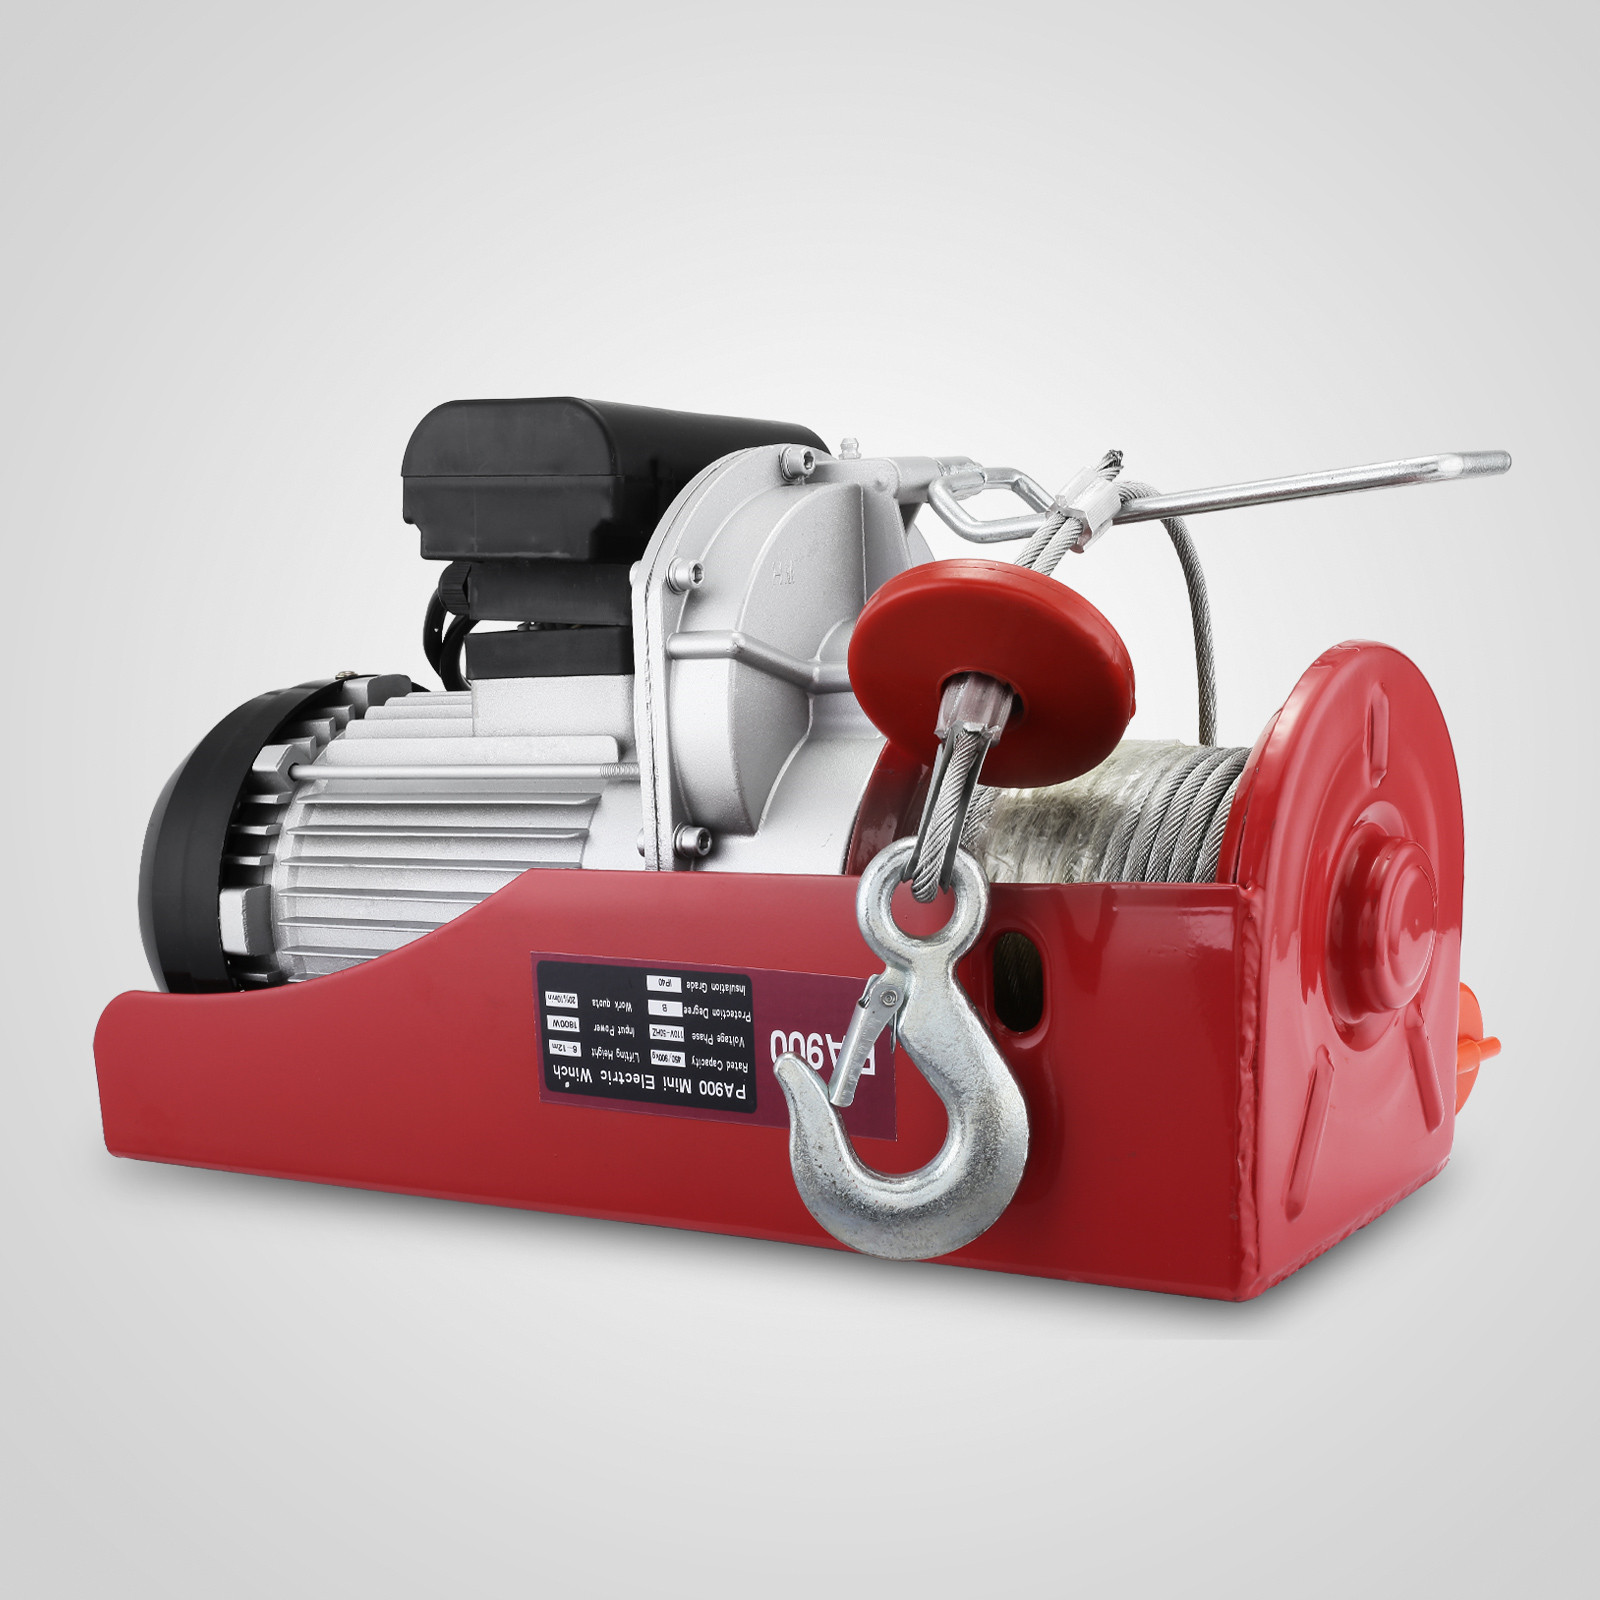 100kg-900kg-Electric-Hoist-Winch-Lifting-Engine-Crane-Cable-Lift-Hook-Garage miniature 64